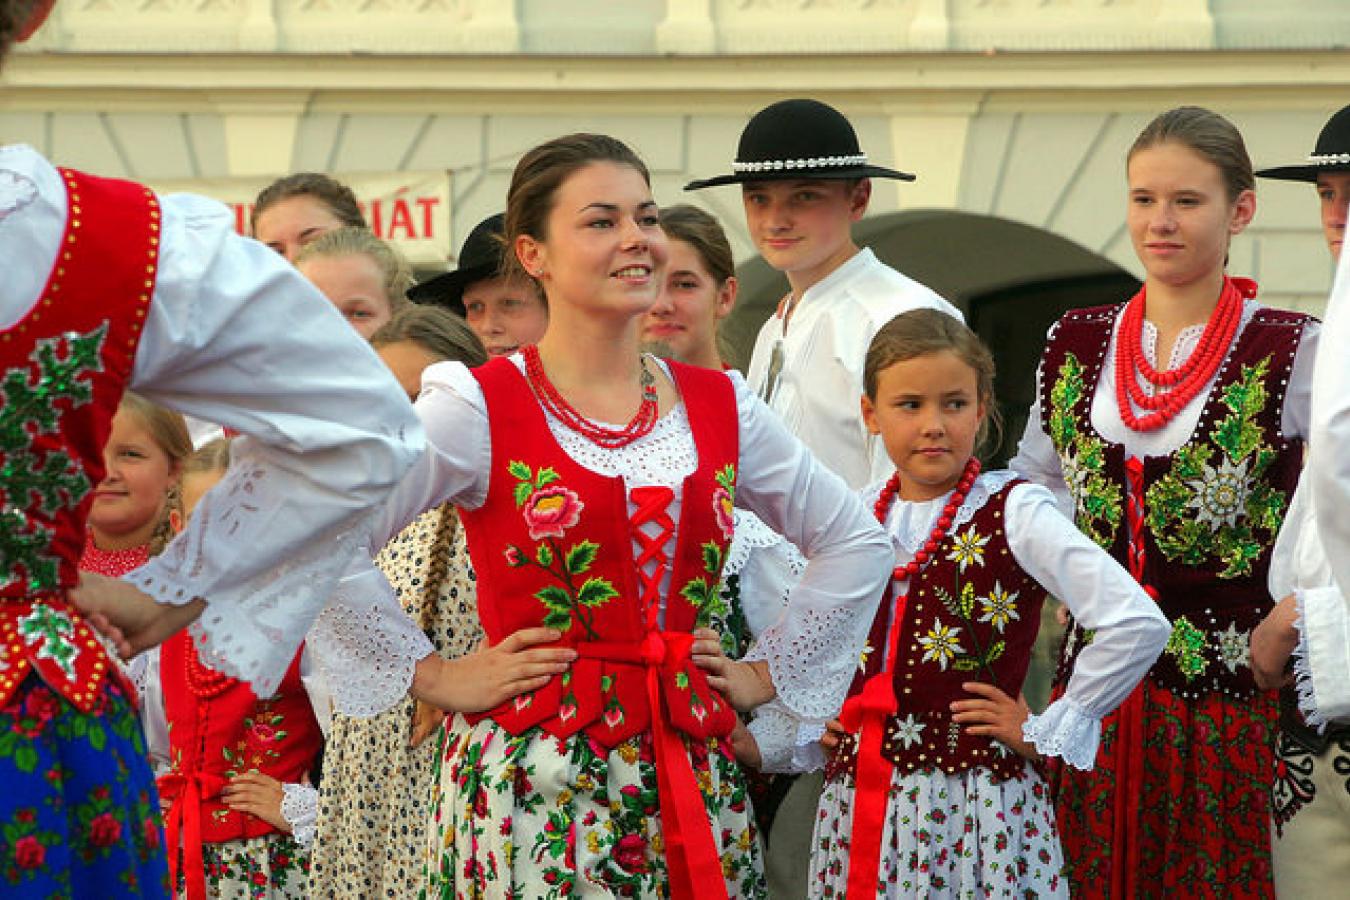 Polish Traditional Dress 18.8.16 Svatek Casu CB 117